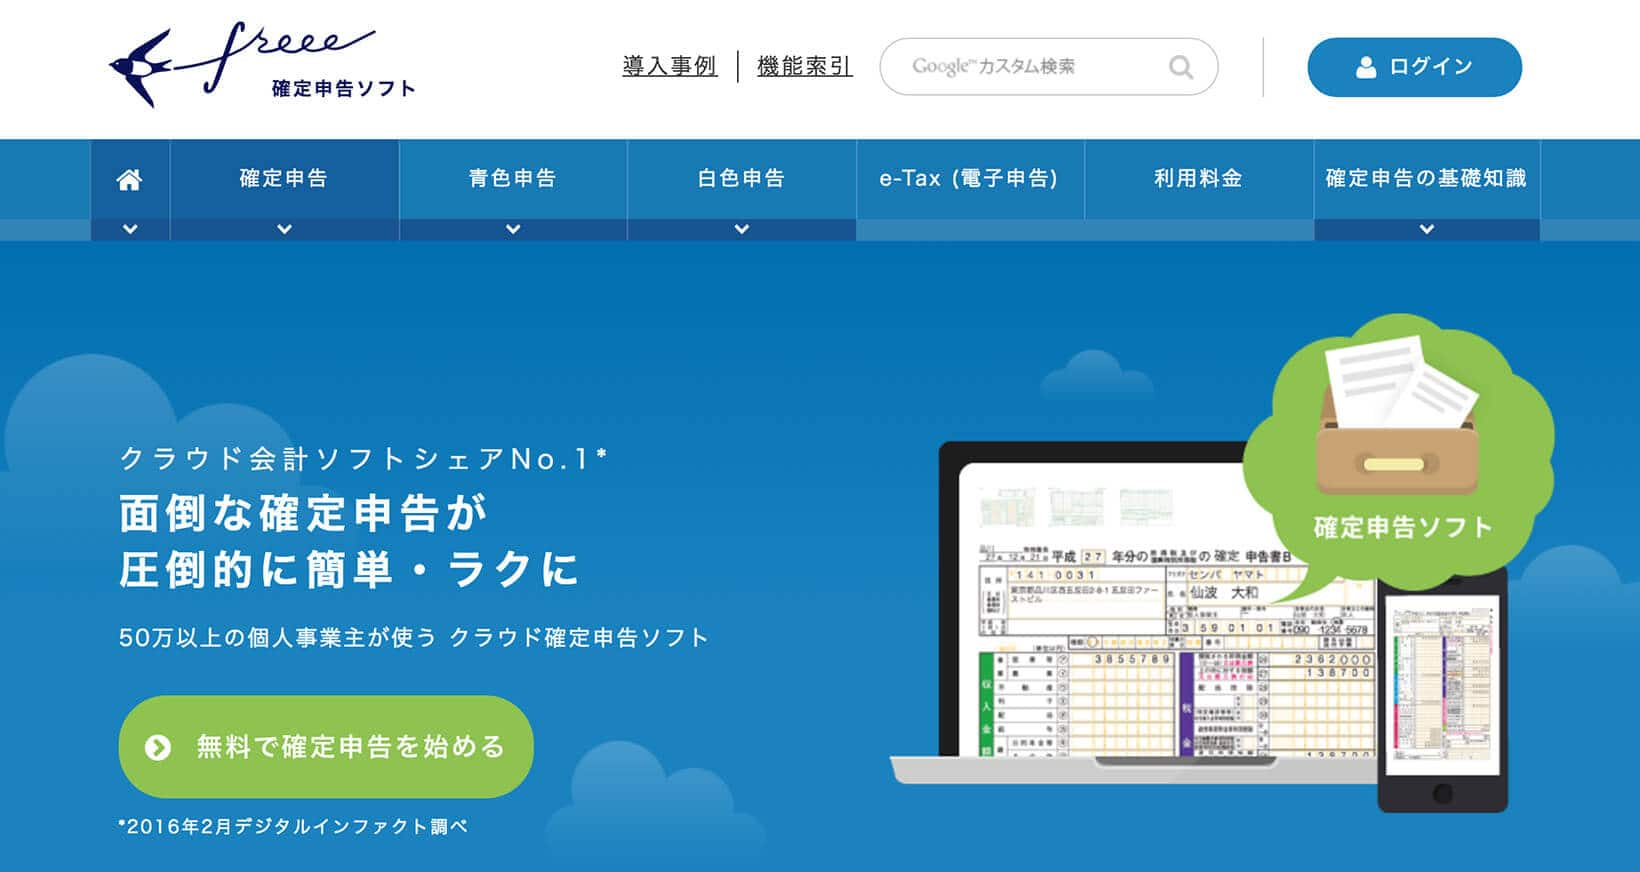 freee 確定申告 オンライン会計ソフト フリーランス 簡単 間に合う